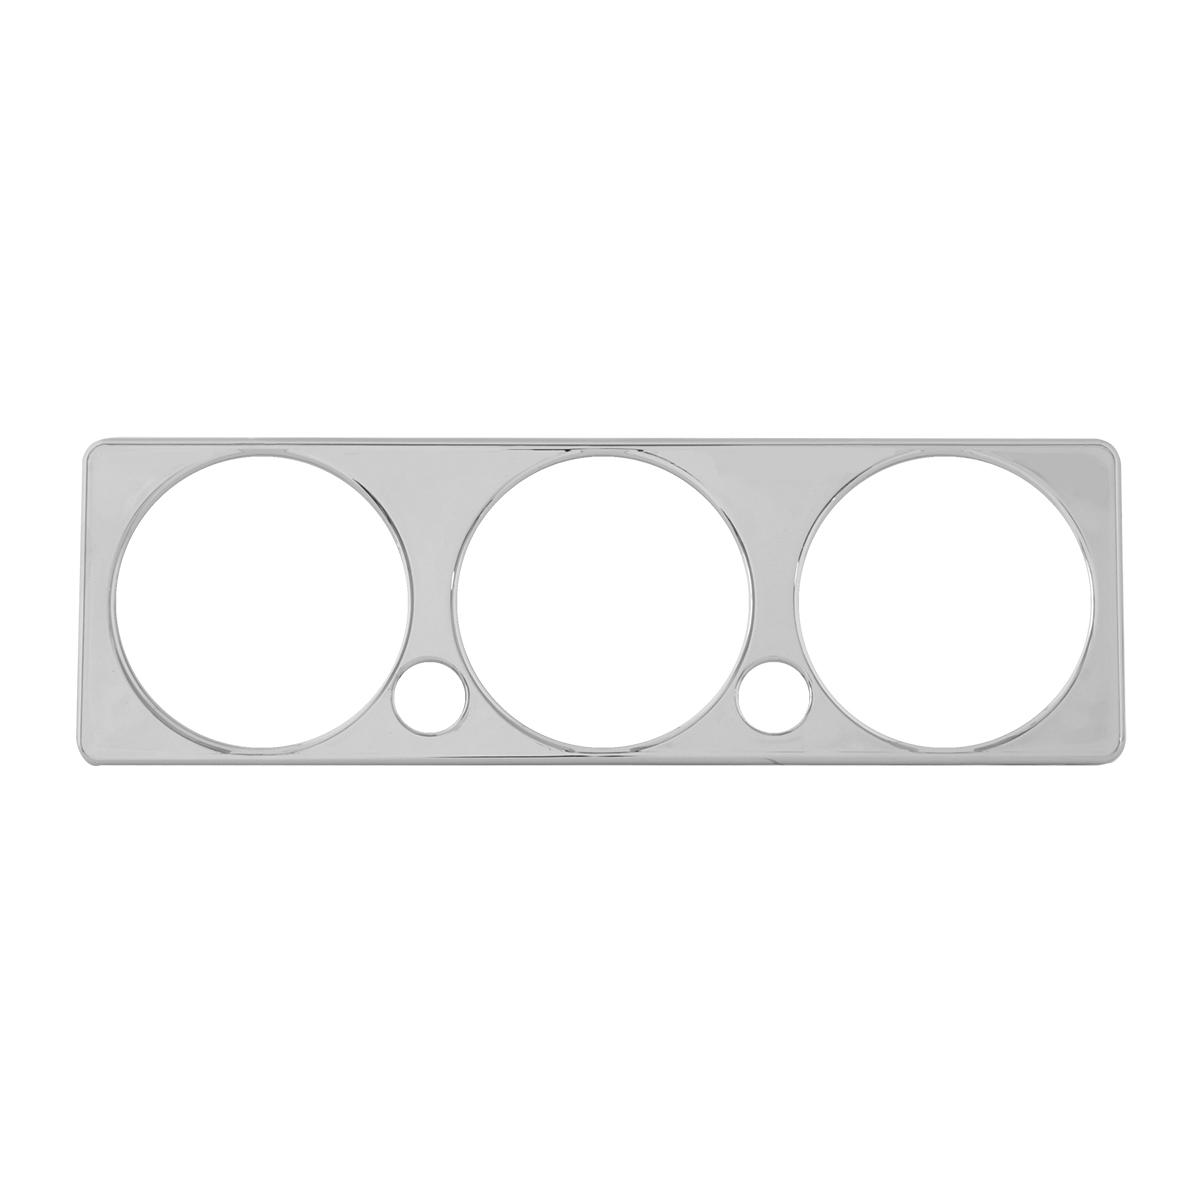 68347 Chrome Plastic A/C Control Plate Cover for Peterbilt 2005+